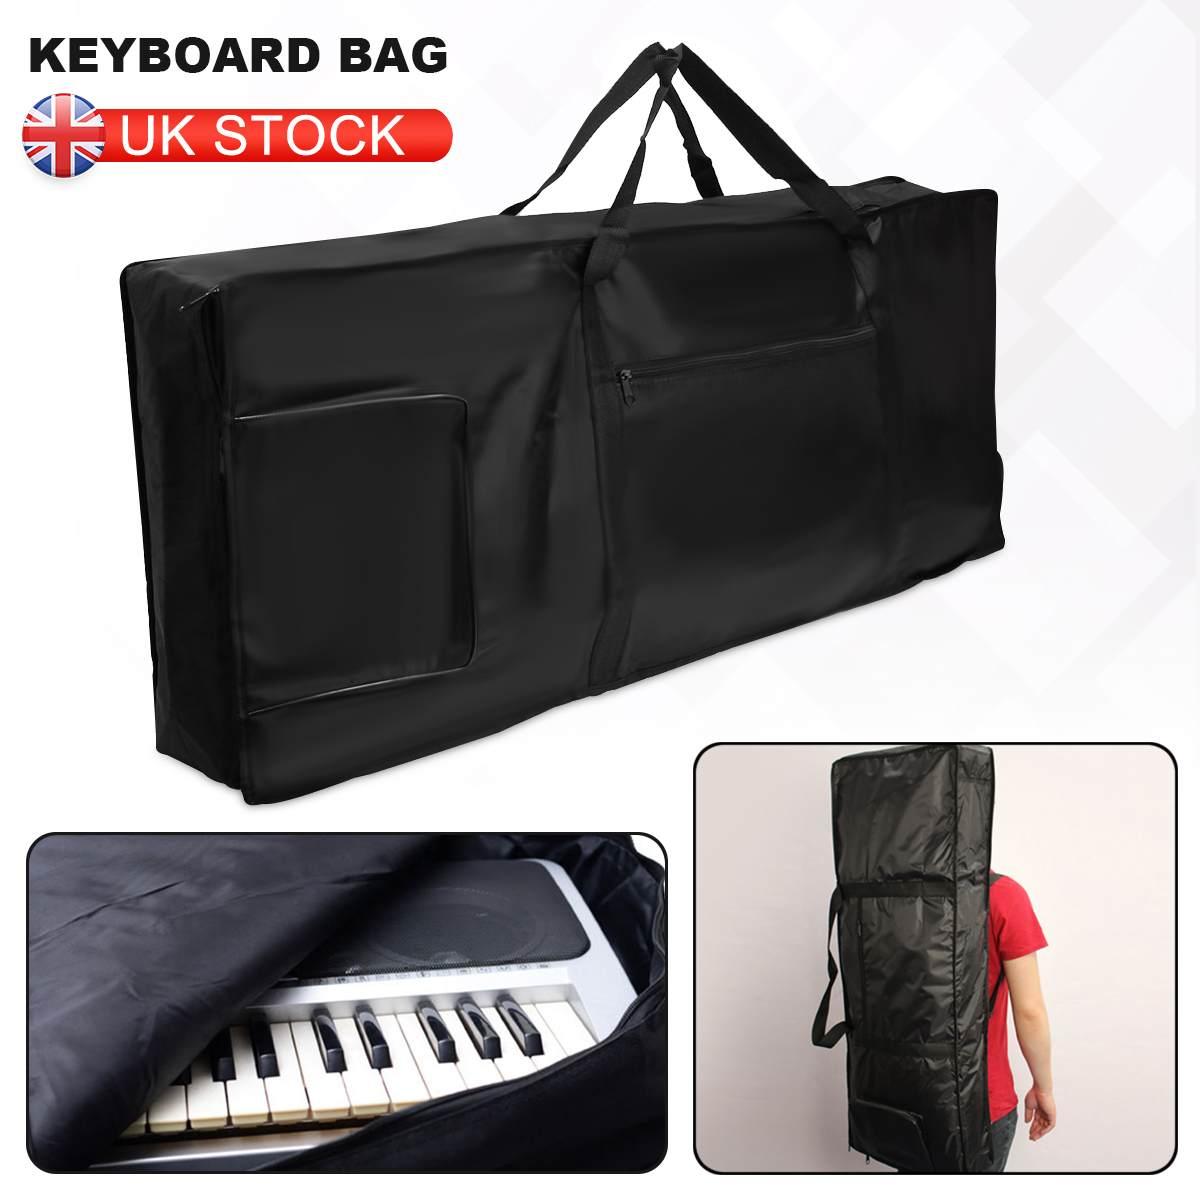 Novo saco de teclado à prova dthick água grossa acolchoado piano elétrico teclado saco 61 chave dupla ombro alças caso acolchoado anti choque